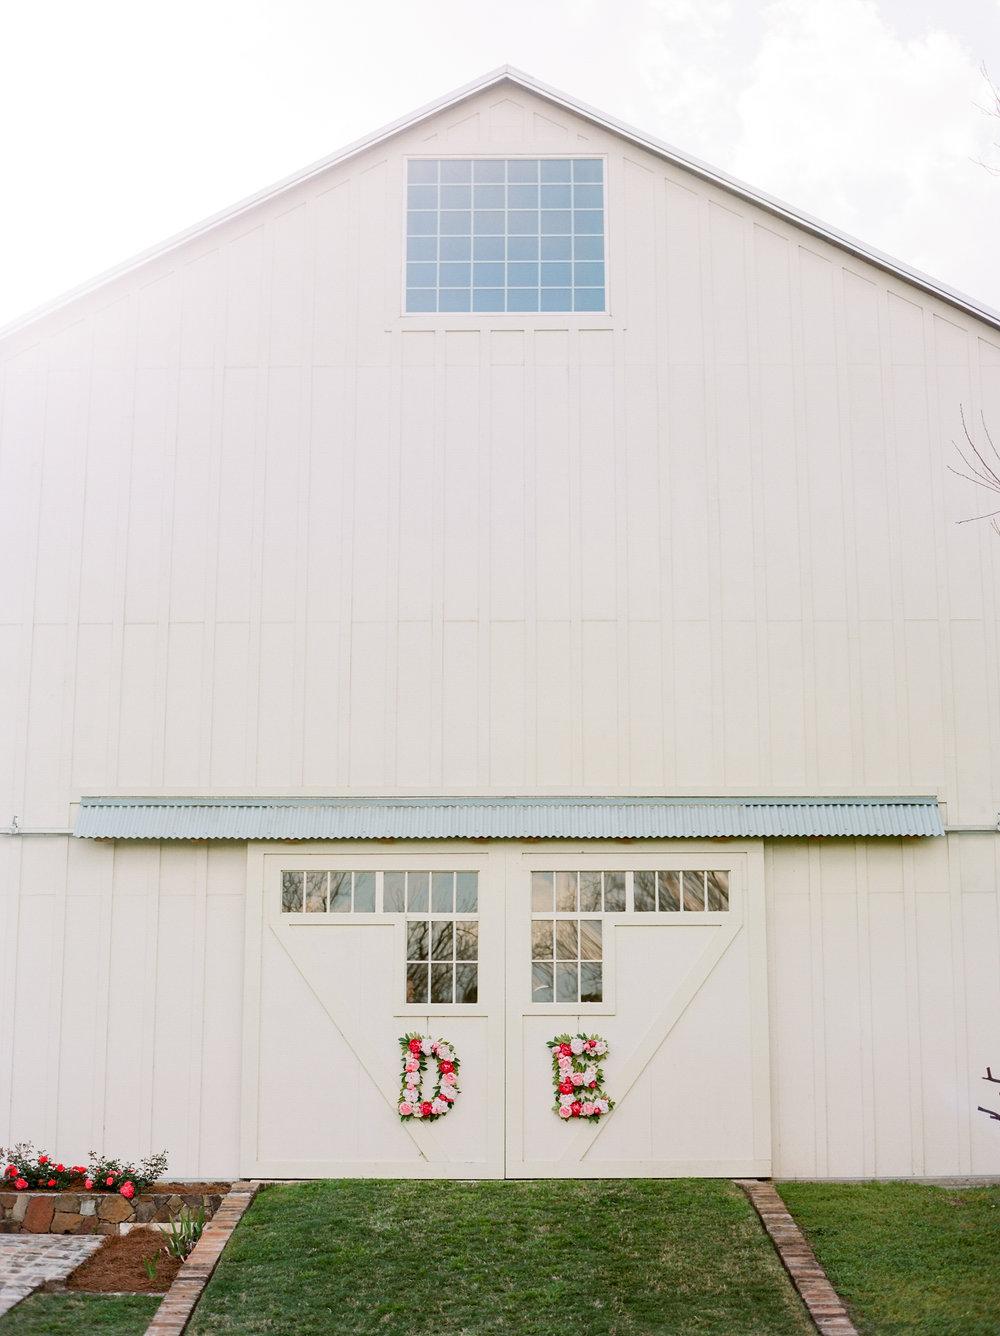 The-Knot-50-Weddings-50-States-Texas-Winner-Dana-Fernandez-photography-houston-wedding-photographer-film-fine-art-destination-25.jpg